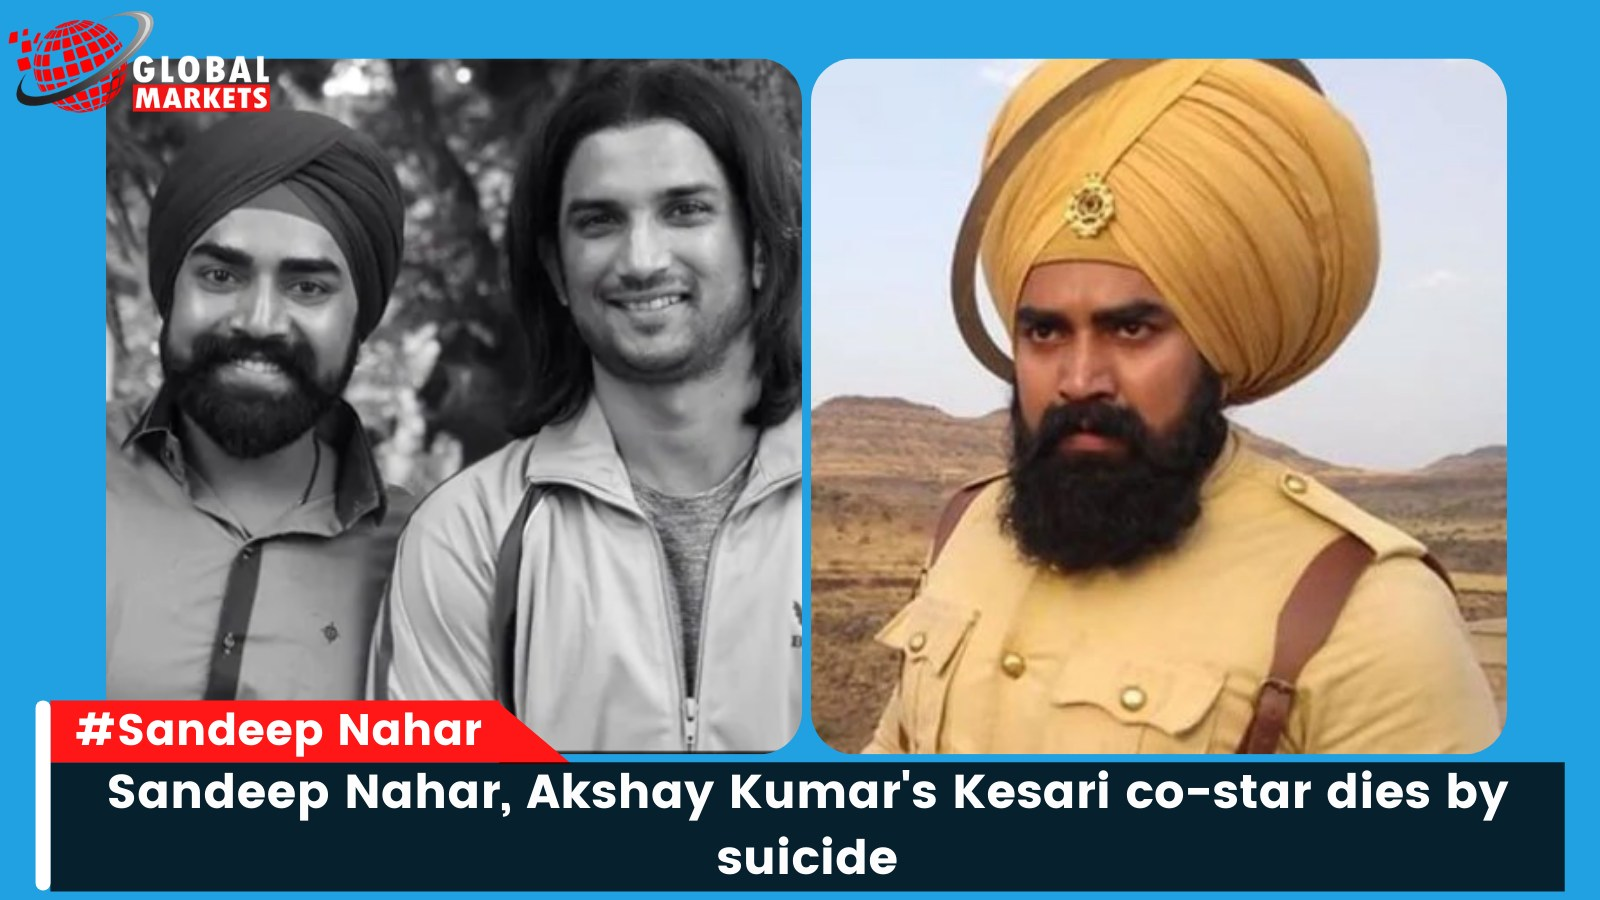 Sandeep Nahar, Akshay Kumar's Kesari co-star dies by suicide